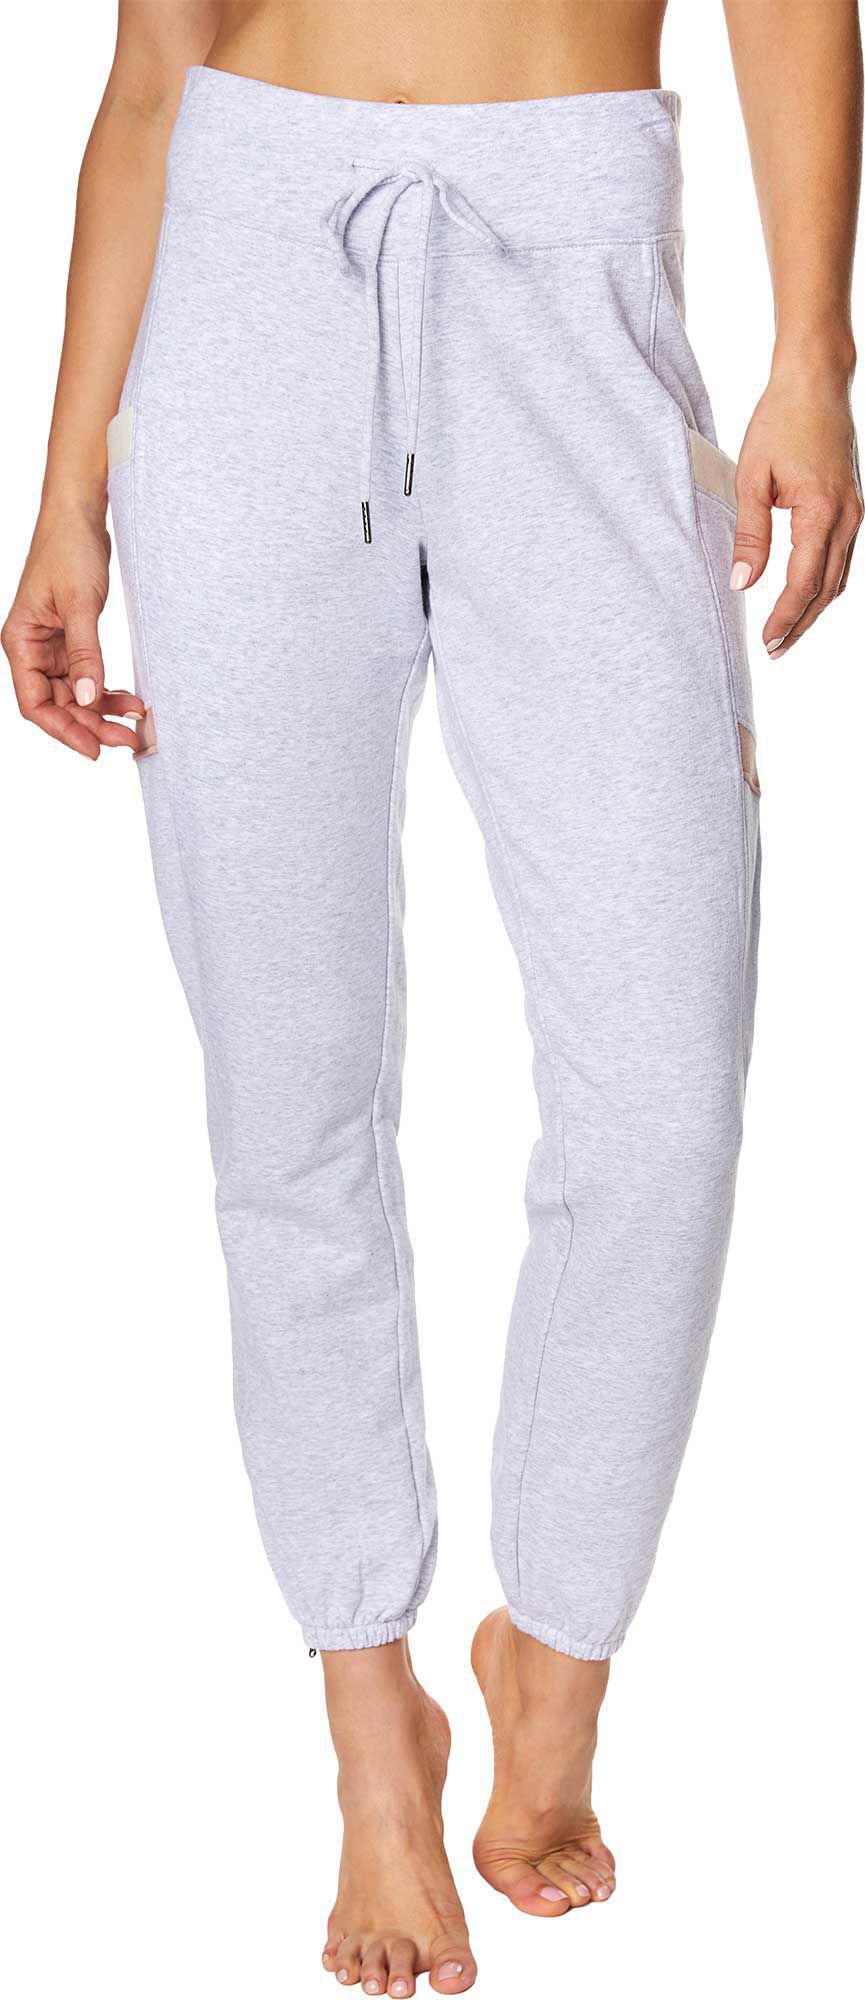 90985d45a6e Betsey Johnson - Gray Chevron Colorblock Sweatpants - Lyst. View fullscreen